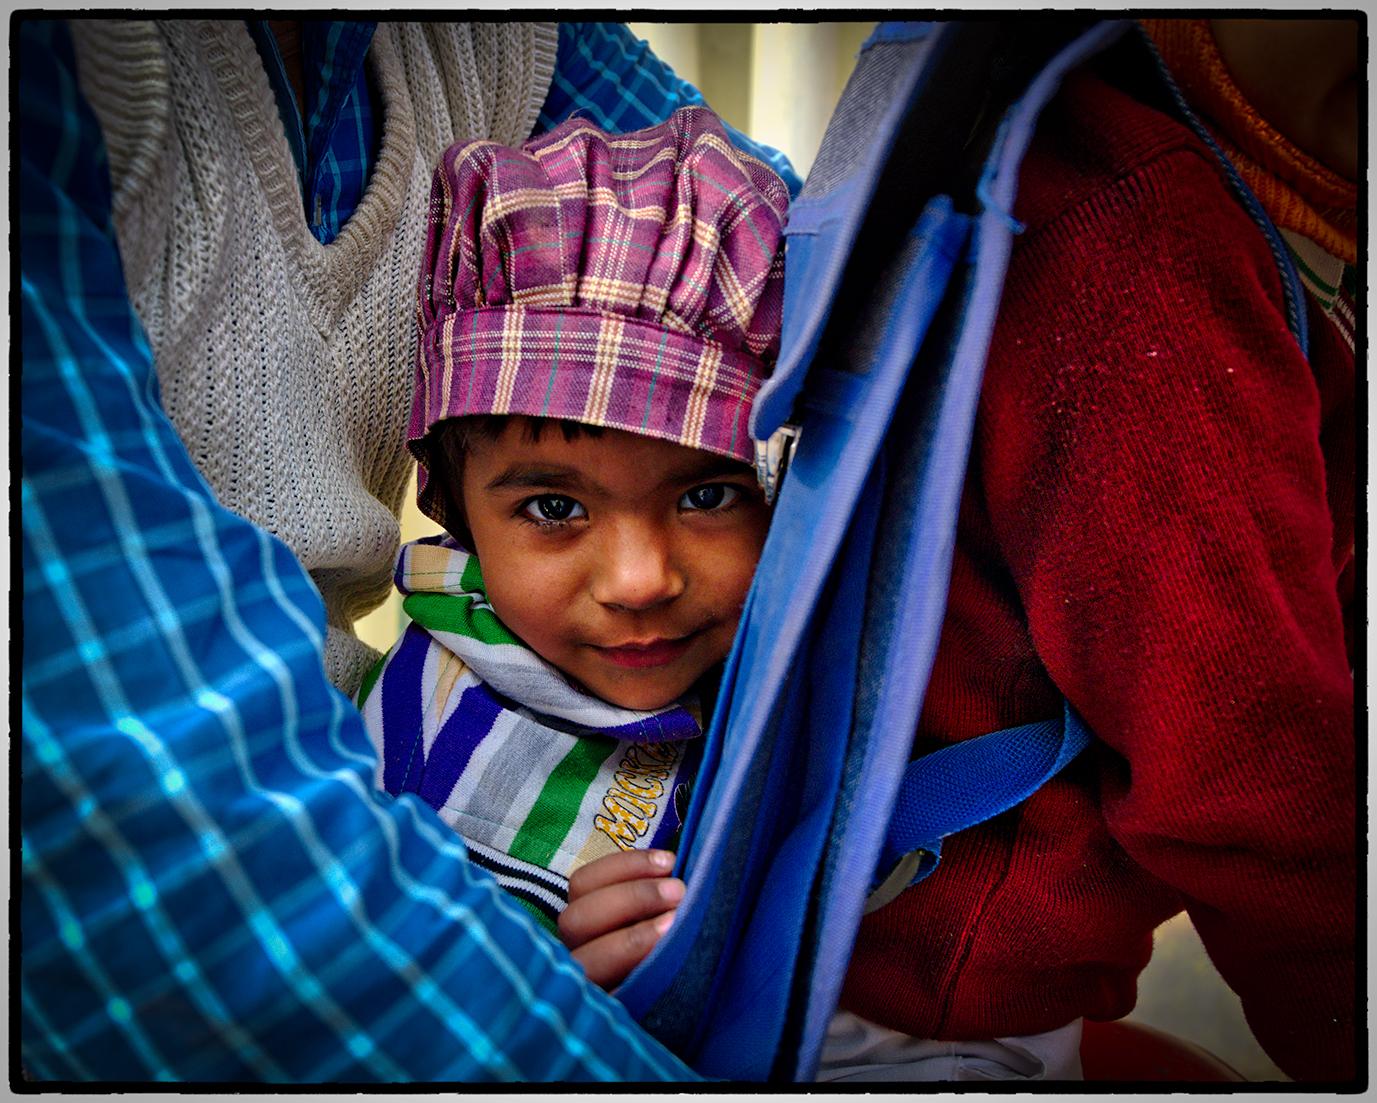 Child on Motorbike, Neemrana, India